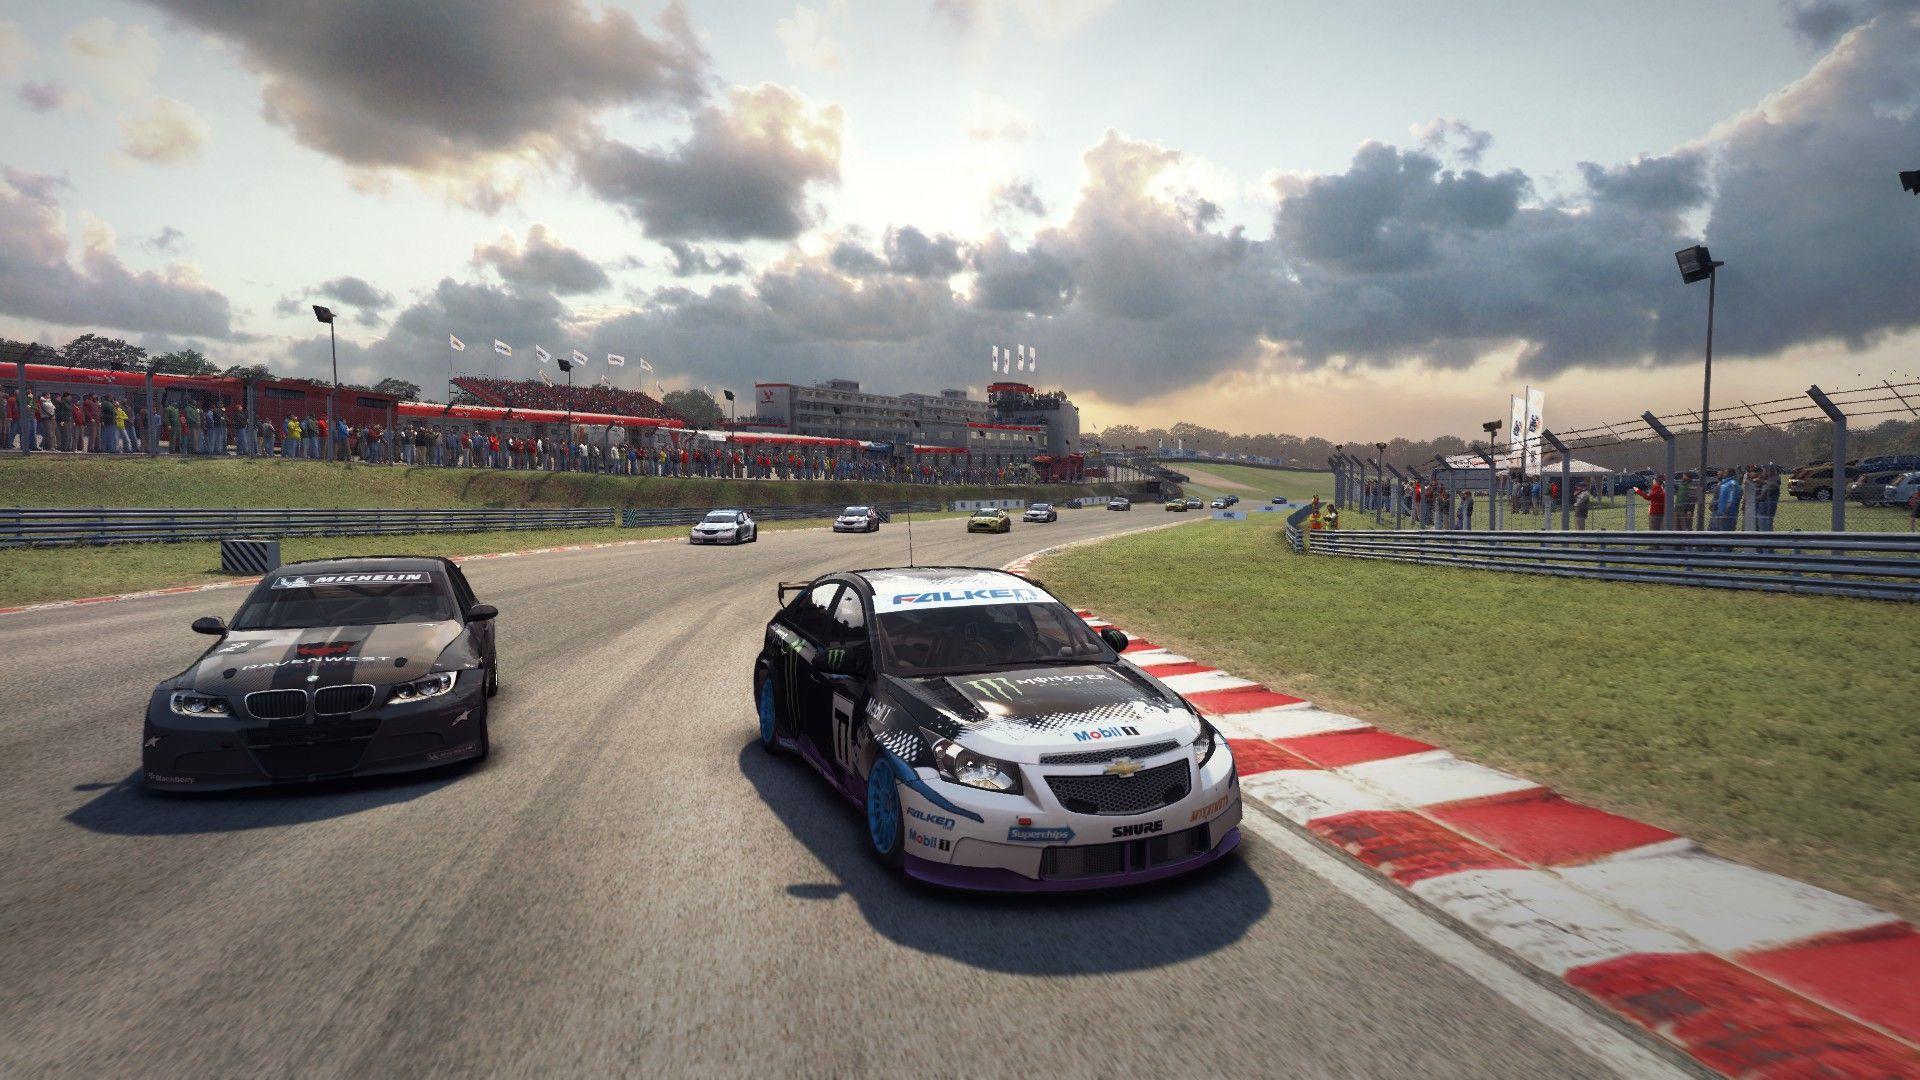 GRID 2 News: GRID Autosport Review